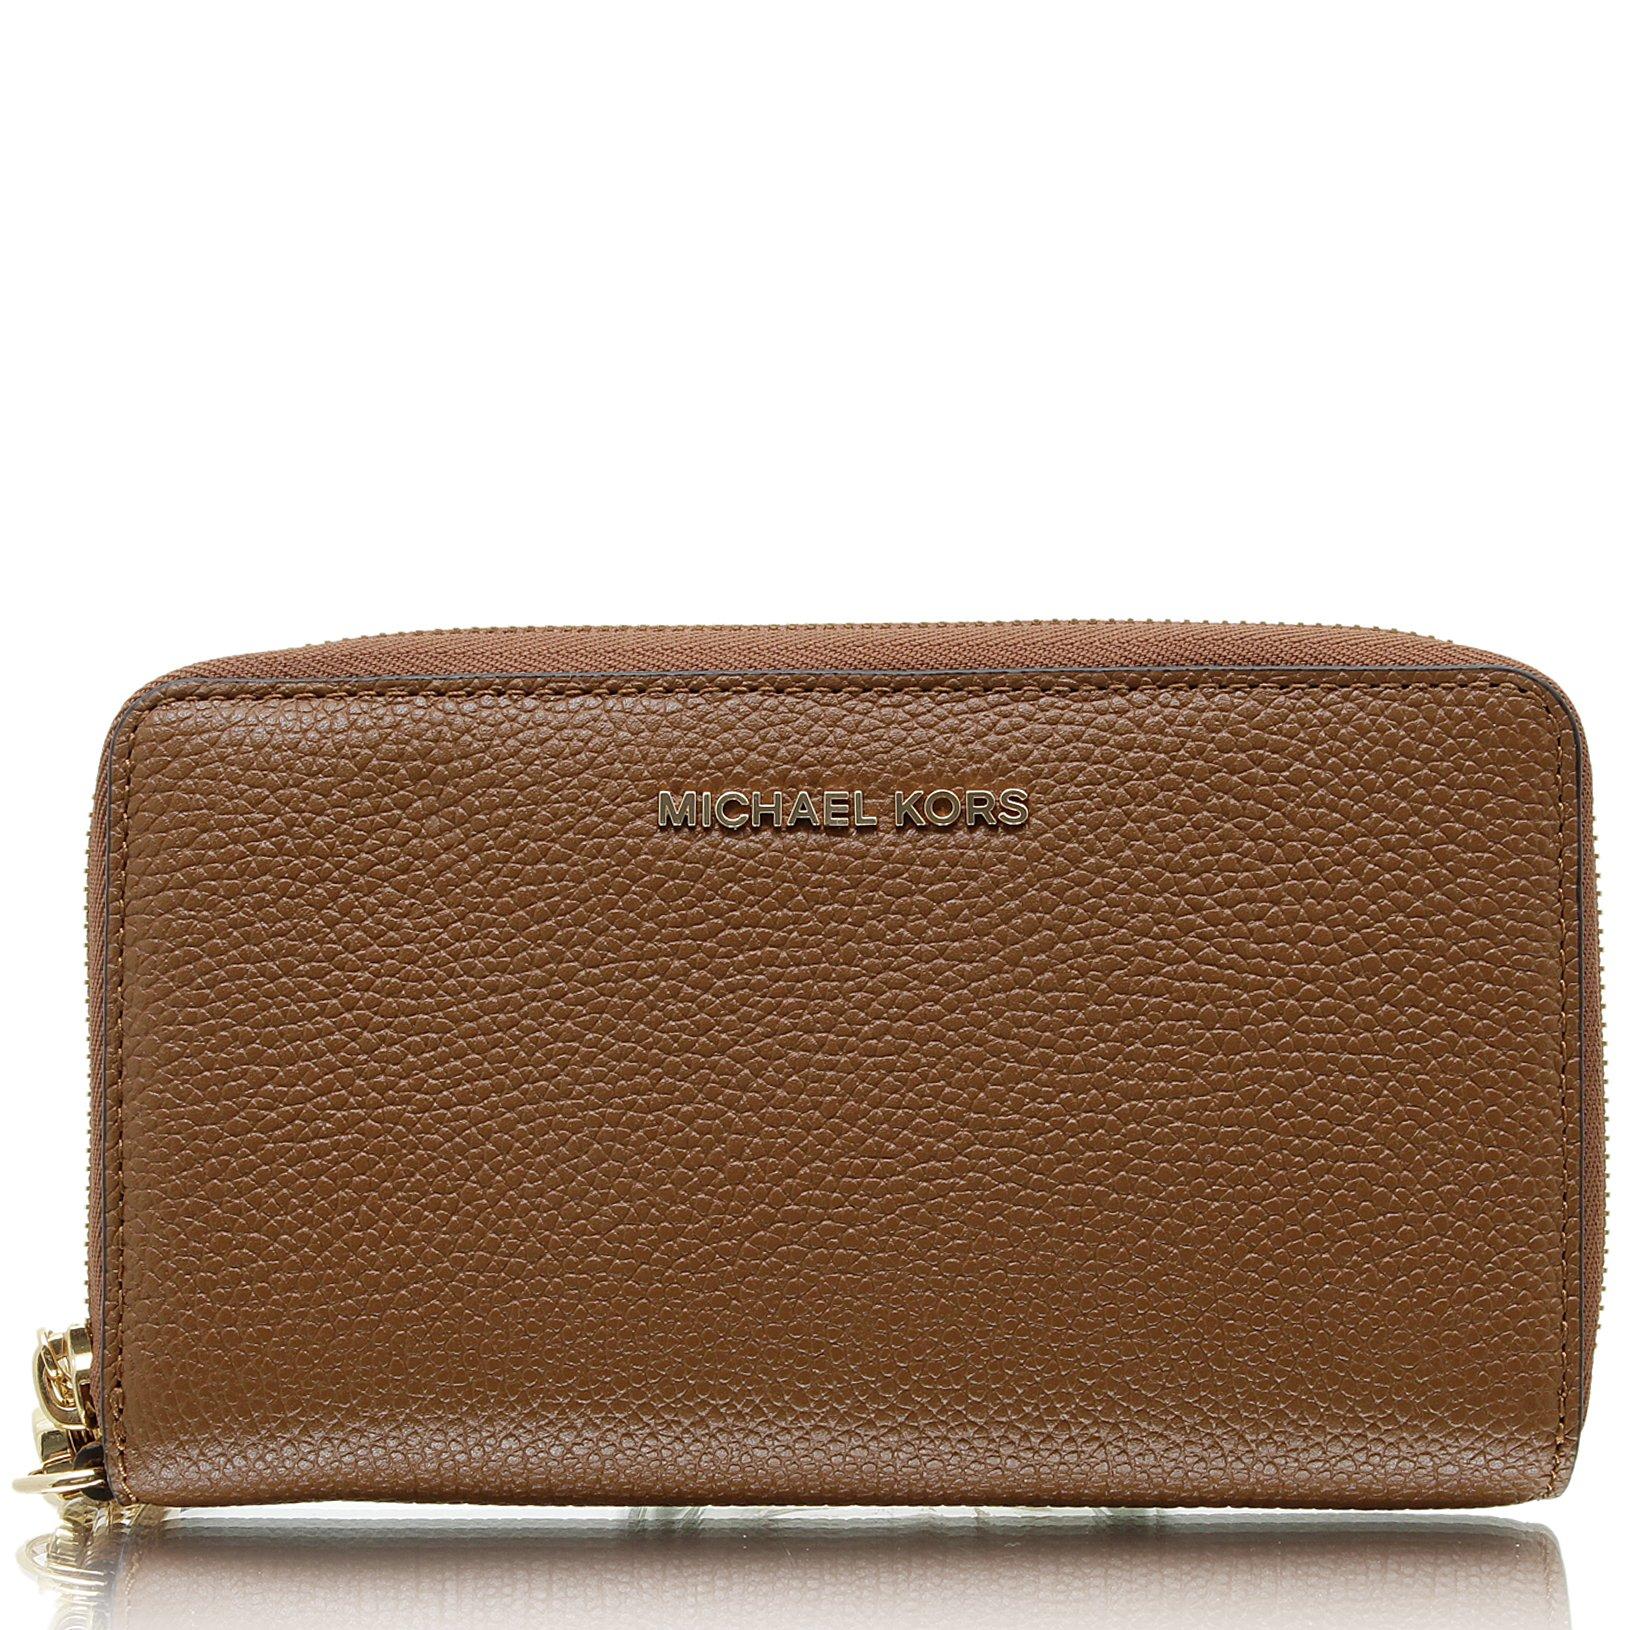 MICHAEL Michael Kors KORS STUDIO Large Flat Phone Case Wristlet Luggage